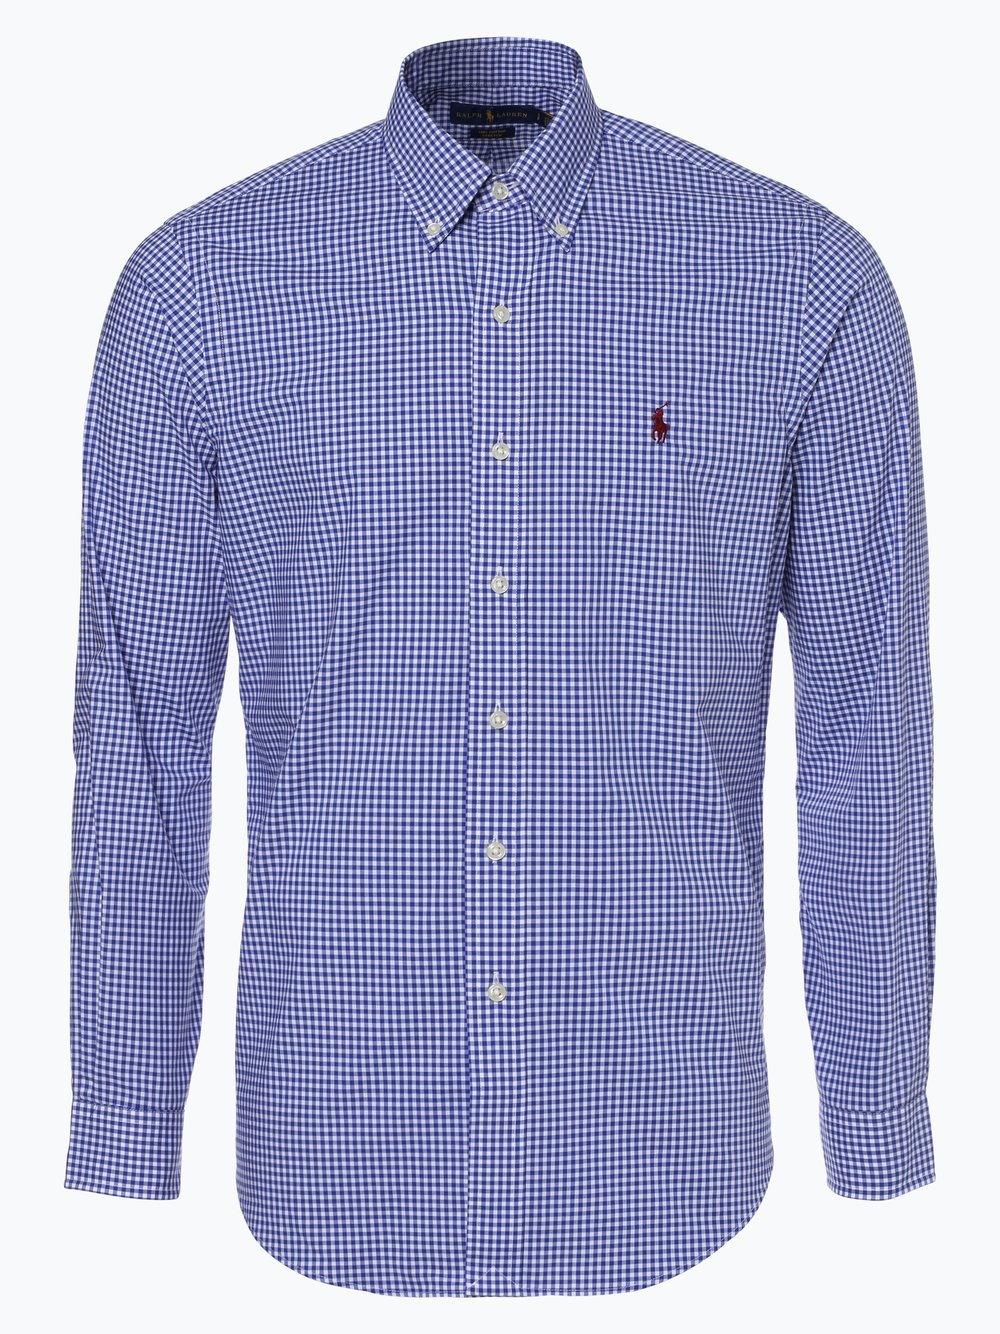 a8c960eb78d2 Polo Ralph Lauren Herren Hemd - Regular Fit  2  online kaufen   PEEK ...